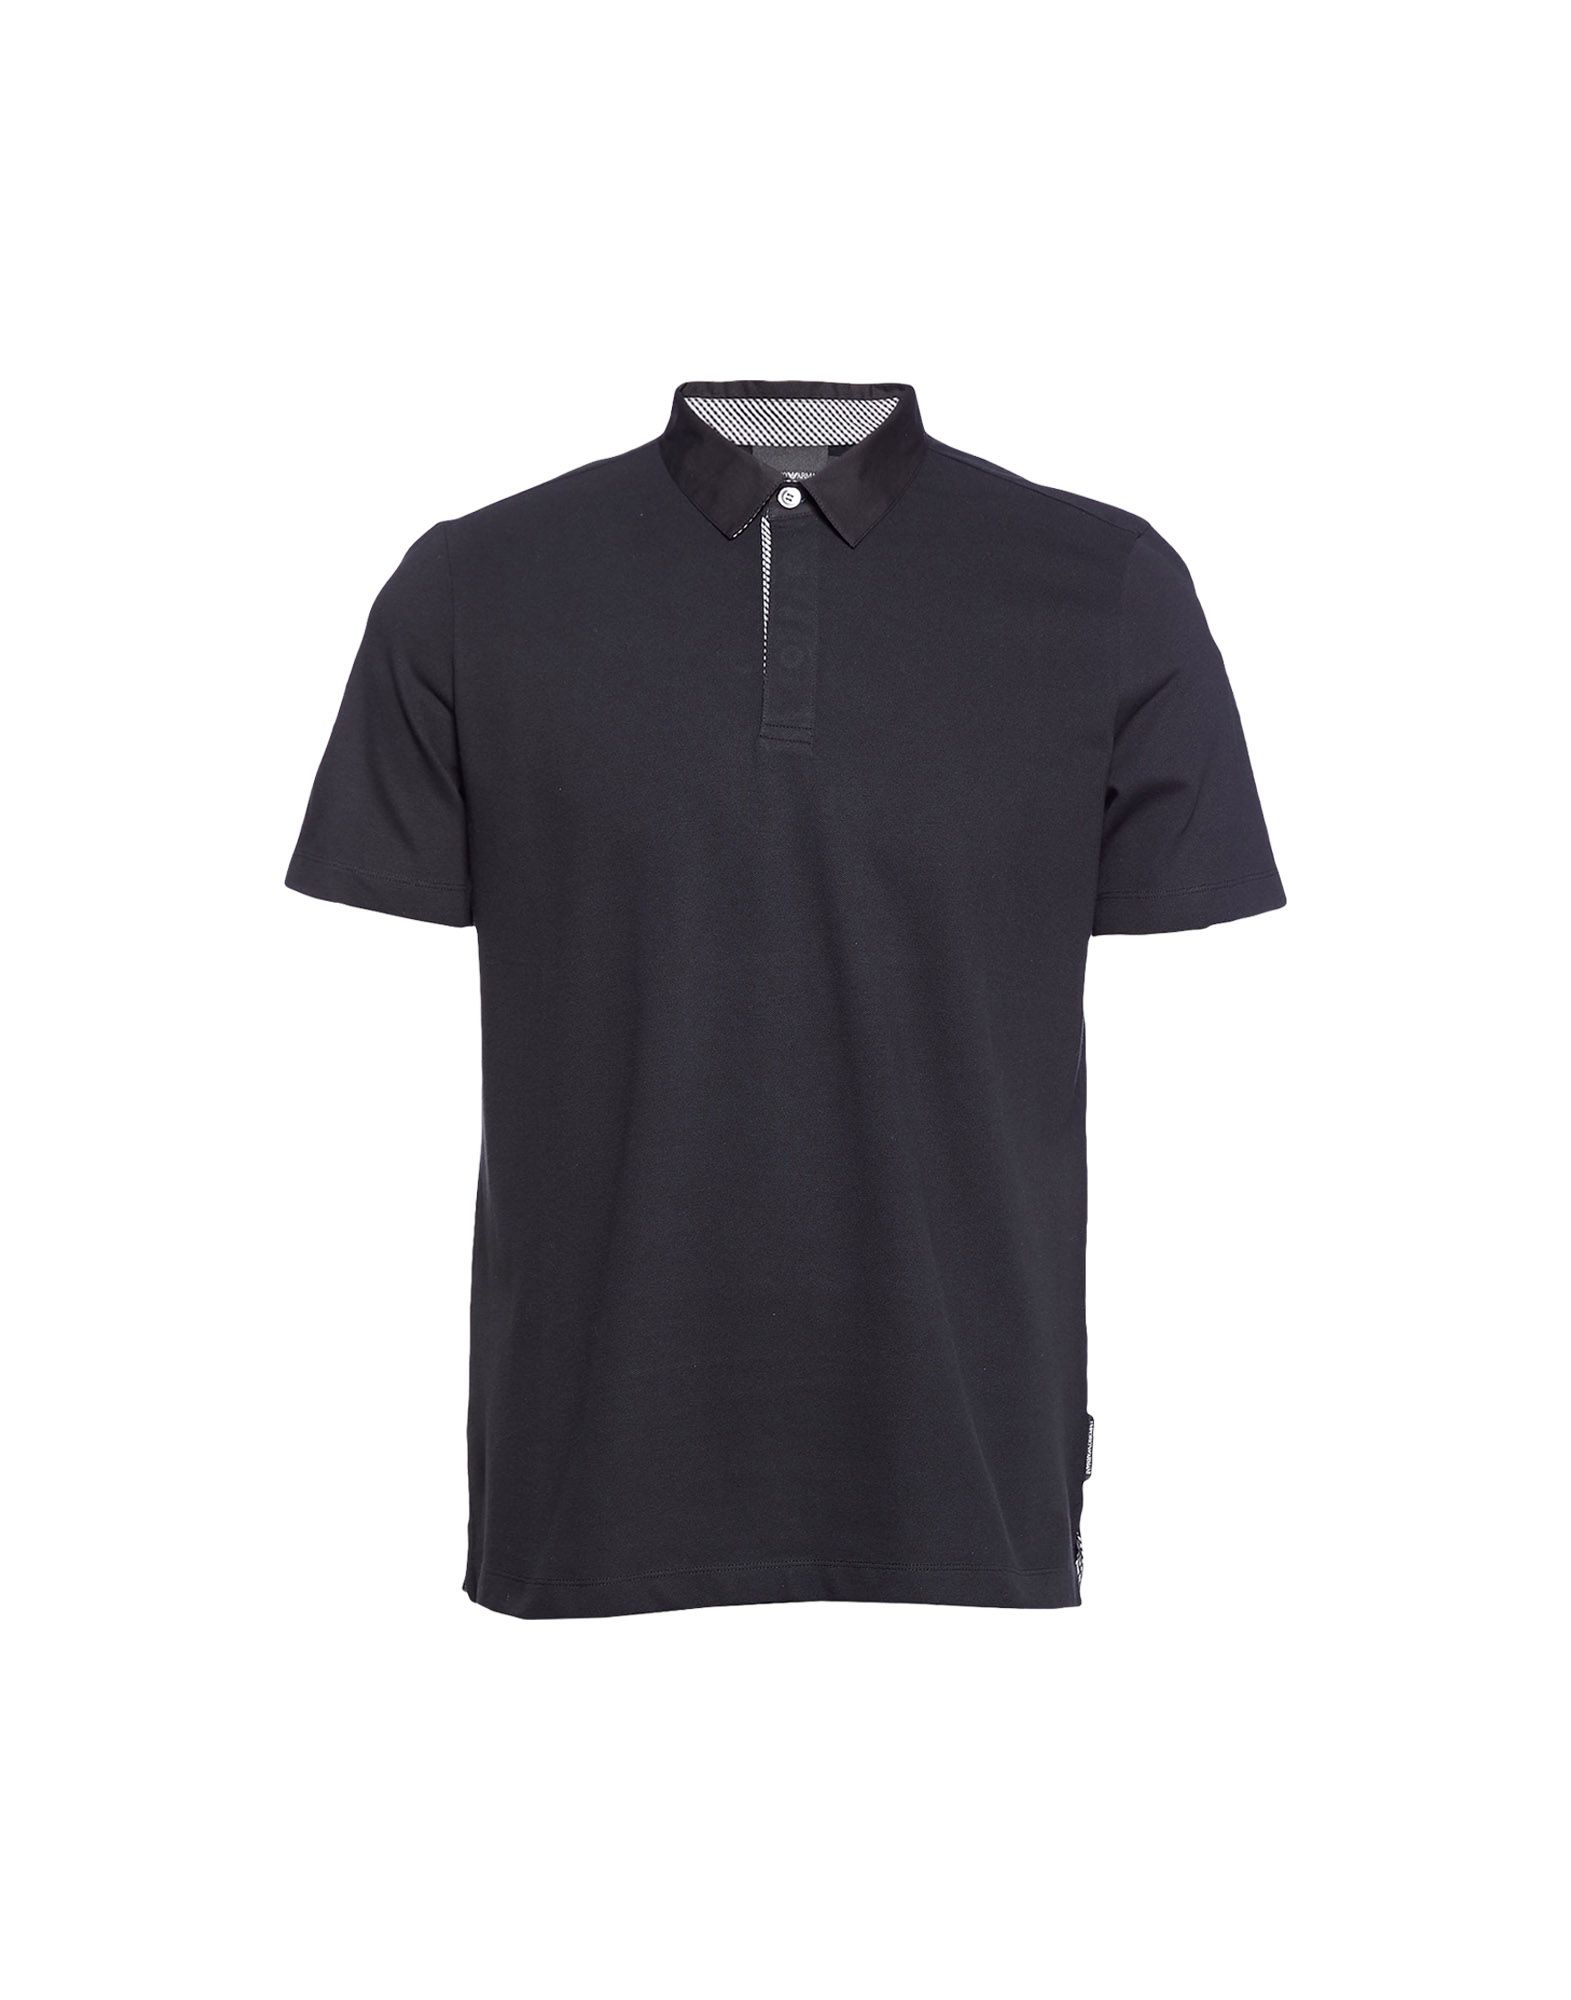 super service Website für Rabatt Bestbewertet echt Armani Polo Shirts Sale – Büyüdüm Çocuk Oldum